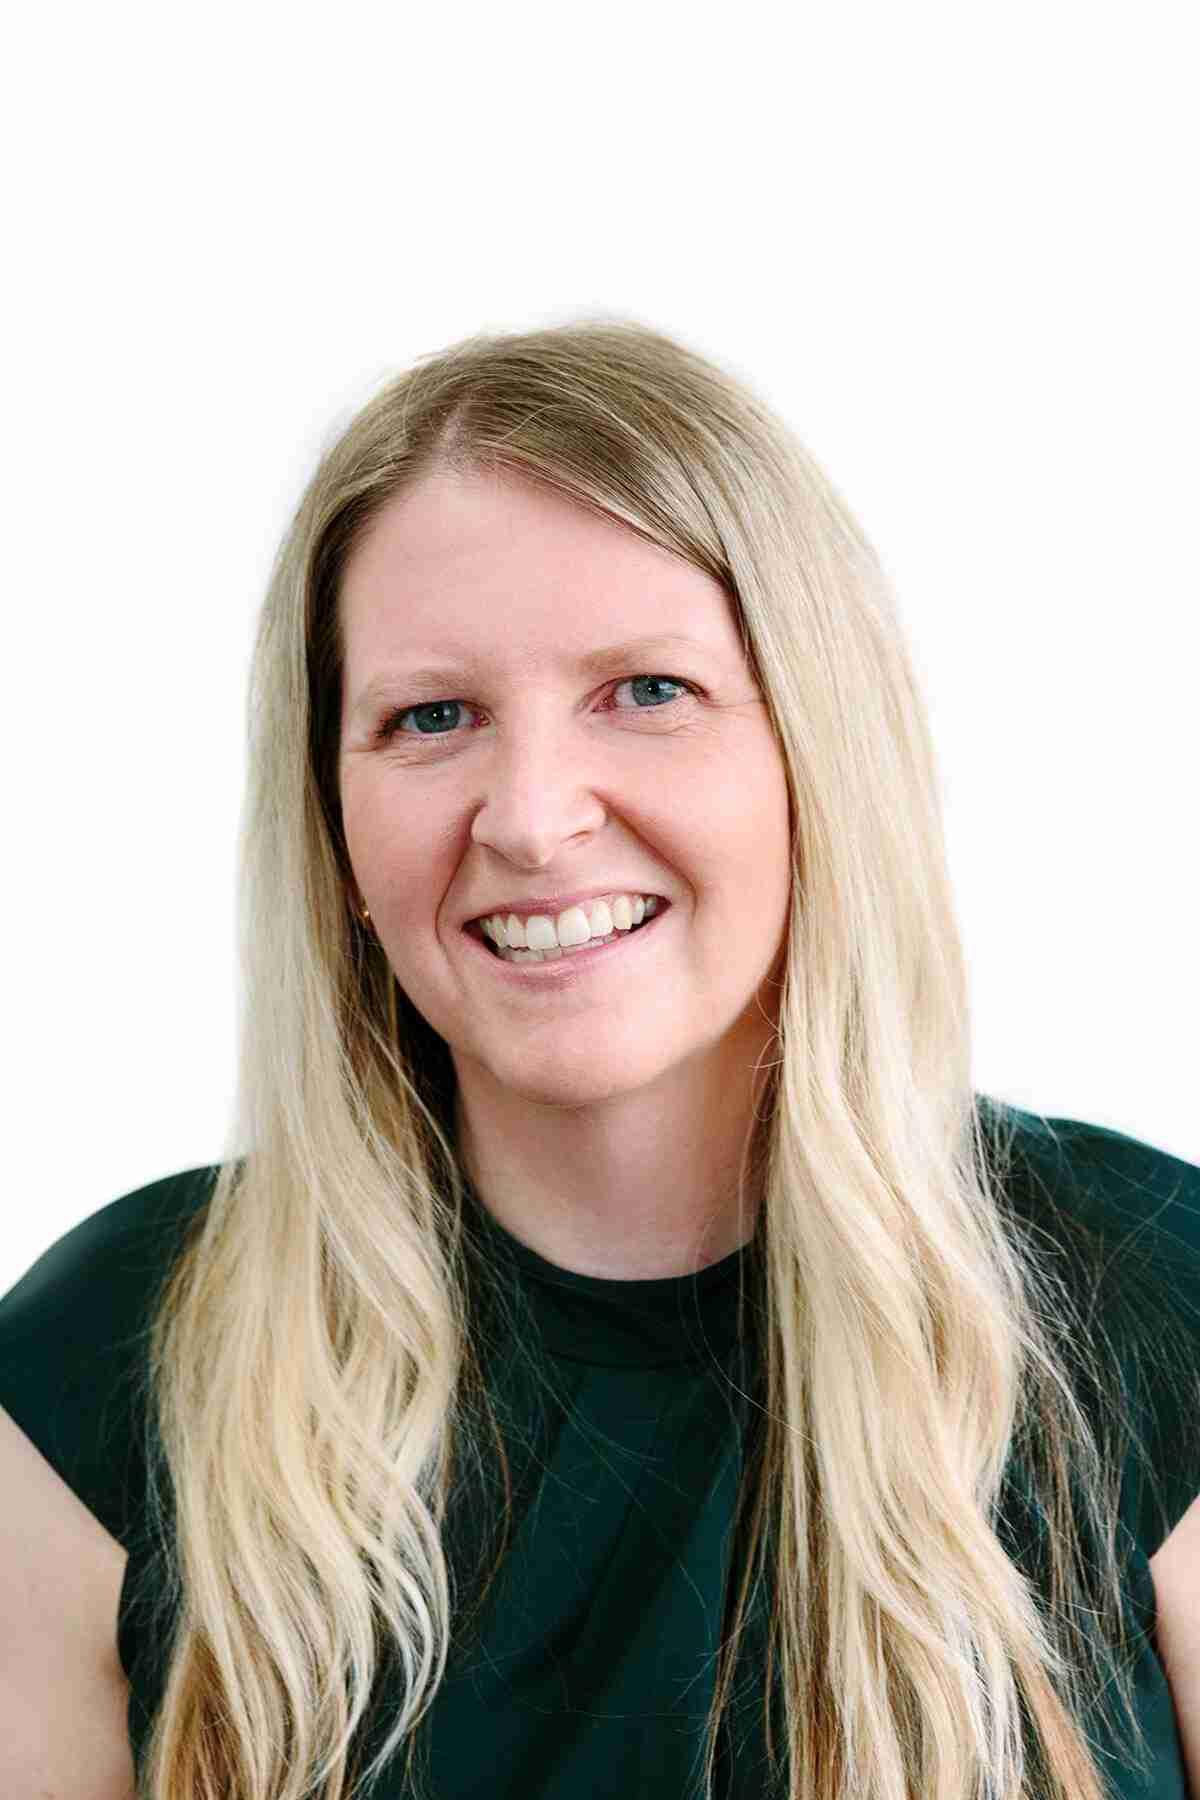 Julie Lobley